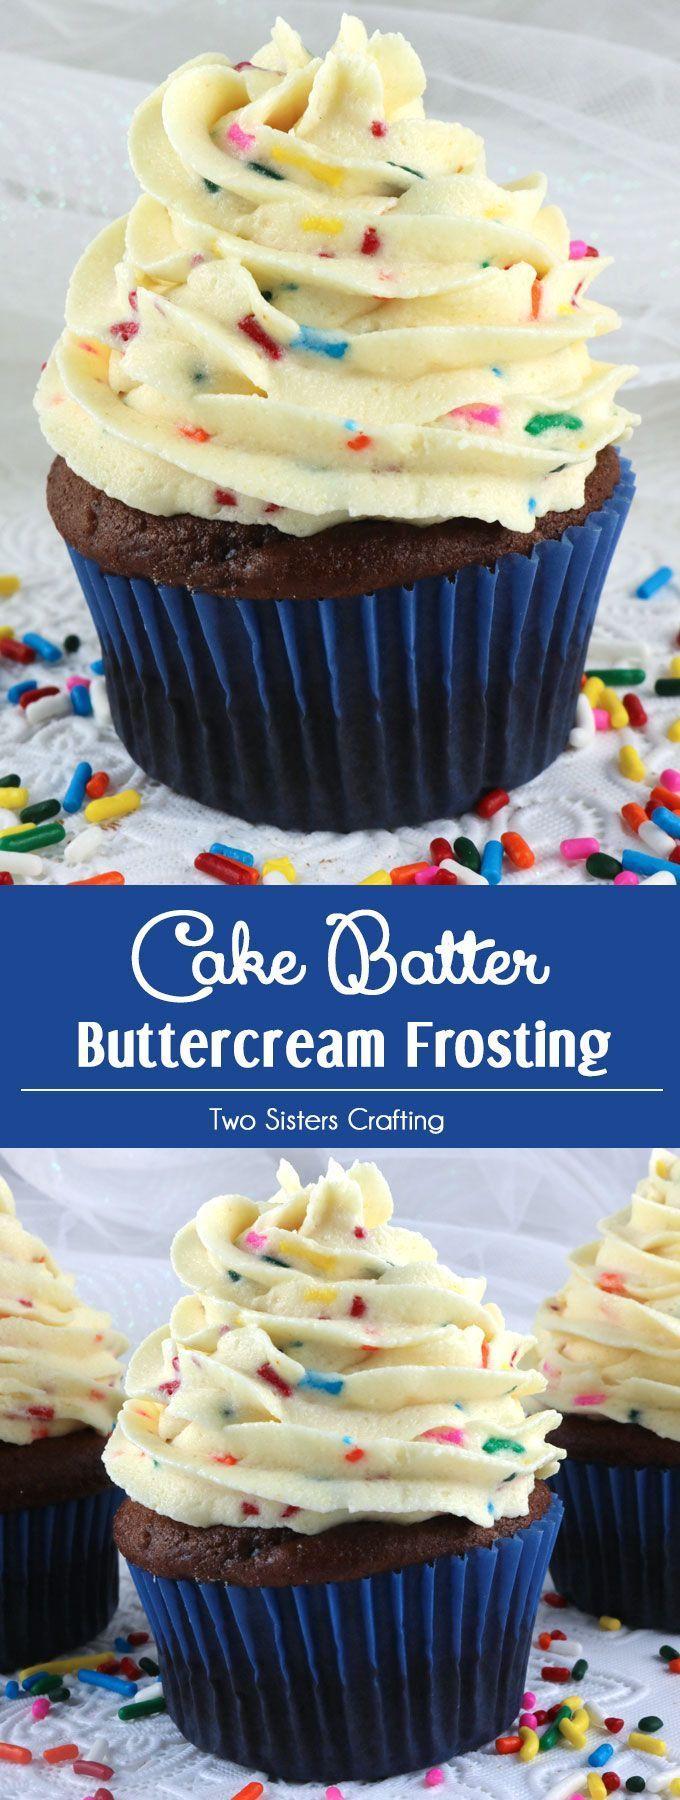 Cake Batter Buttercream Frosting – Chantal @ NerdyMamma.com